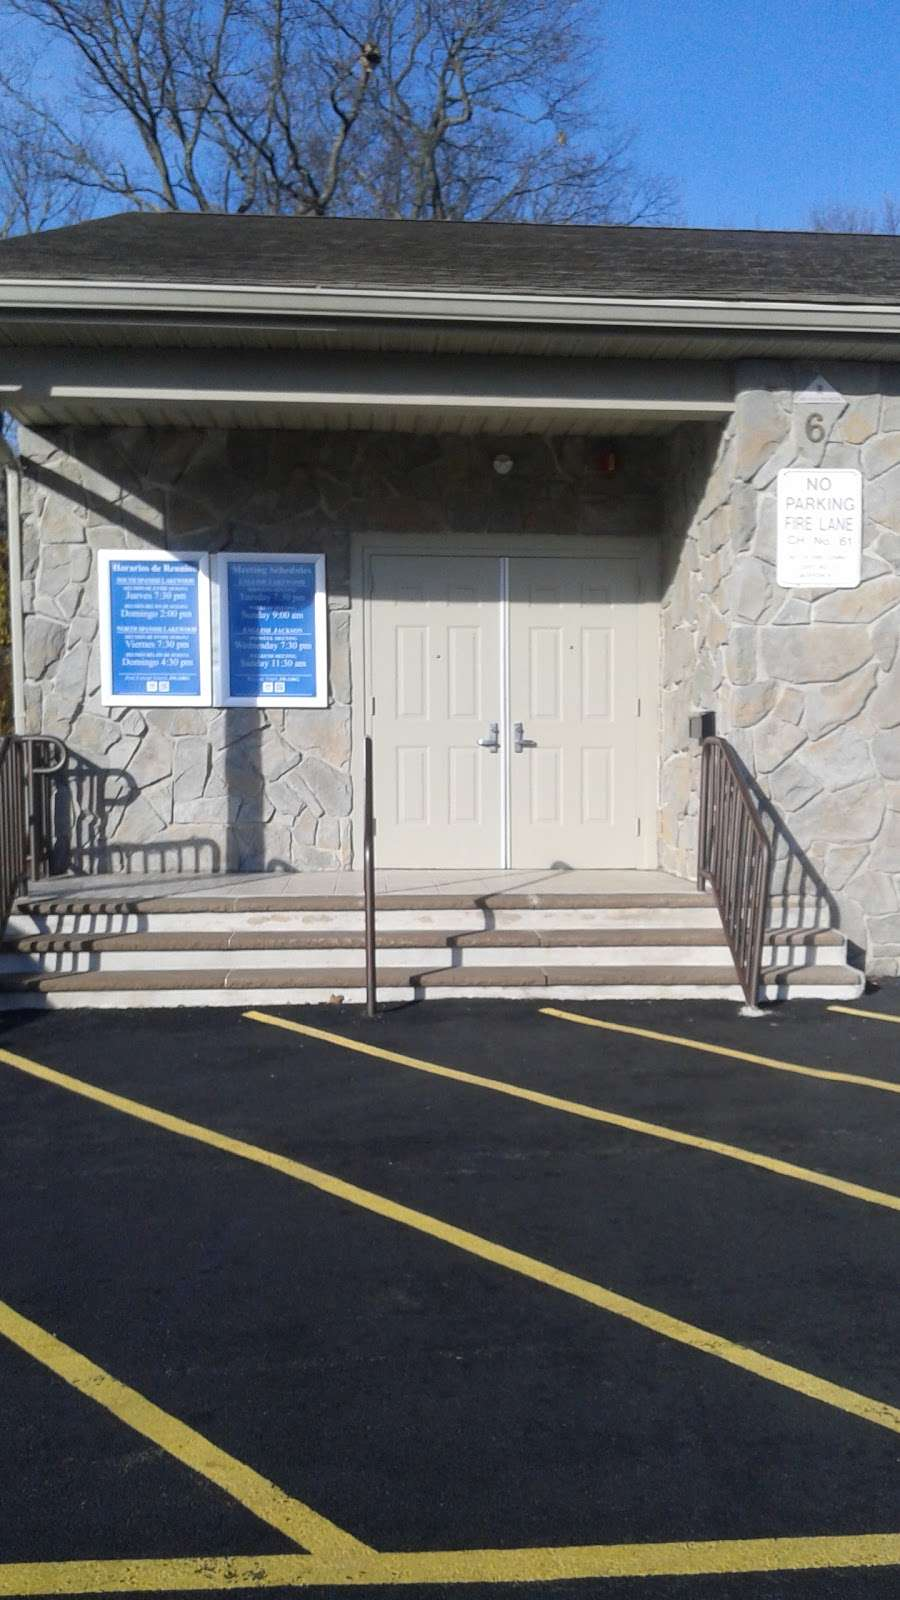 Kingdom Hall of Jehovahs Witnesses - church  | Photo 1 of 1 | Address: 6 Valley Rd, Jackson, NJ 08527, USA | Phone: (732) 364-4489